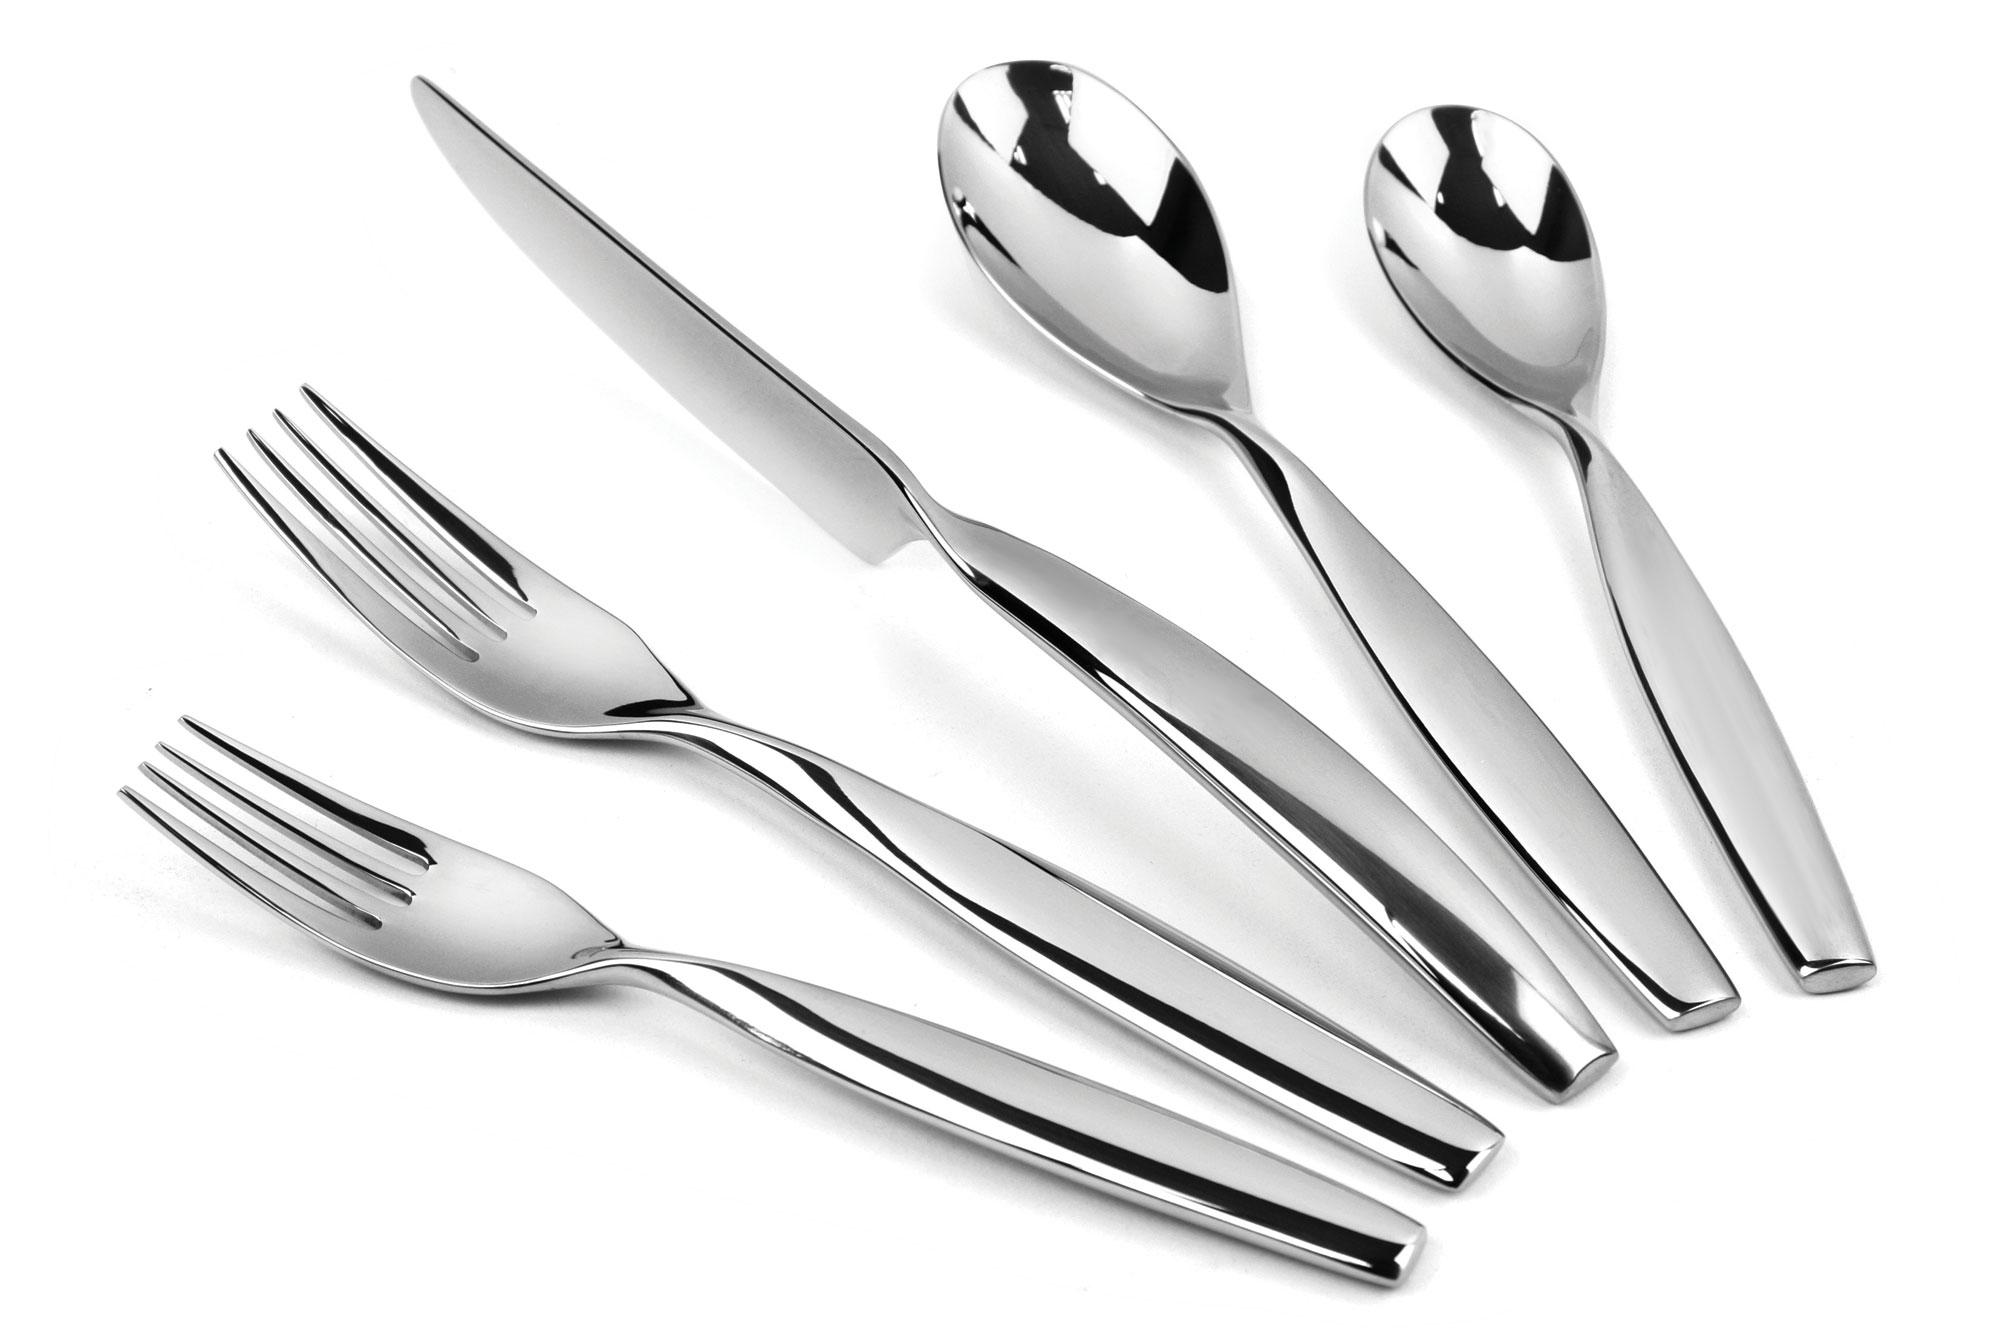 Yamazaki Swivel Stainless Steel Flatware Set 20 Piece